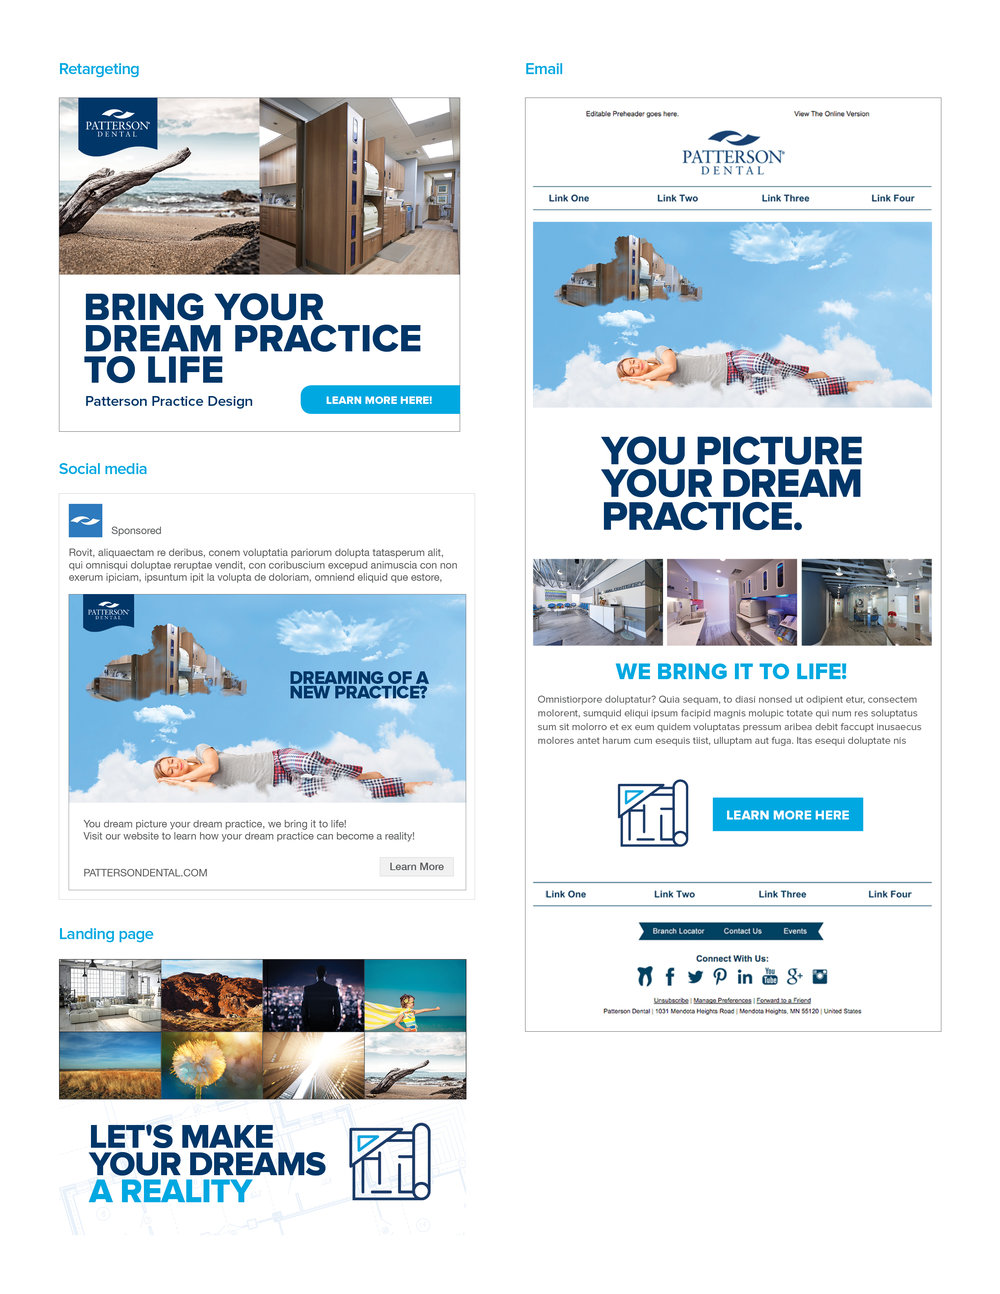 Patterson Digital Marketing